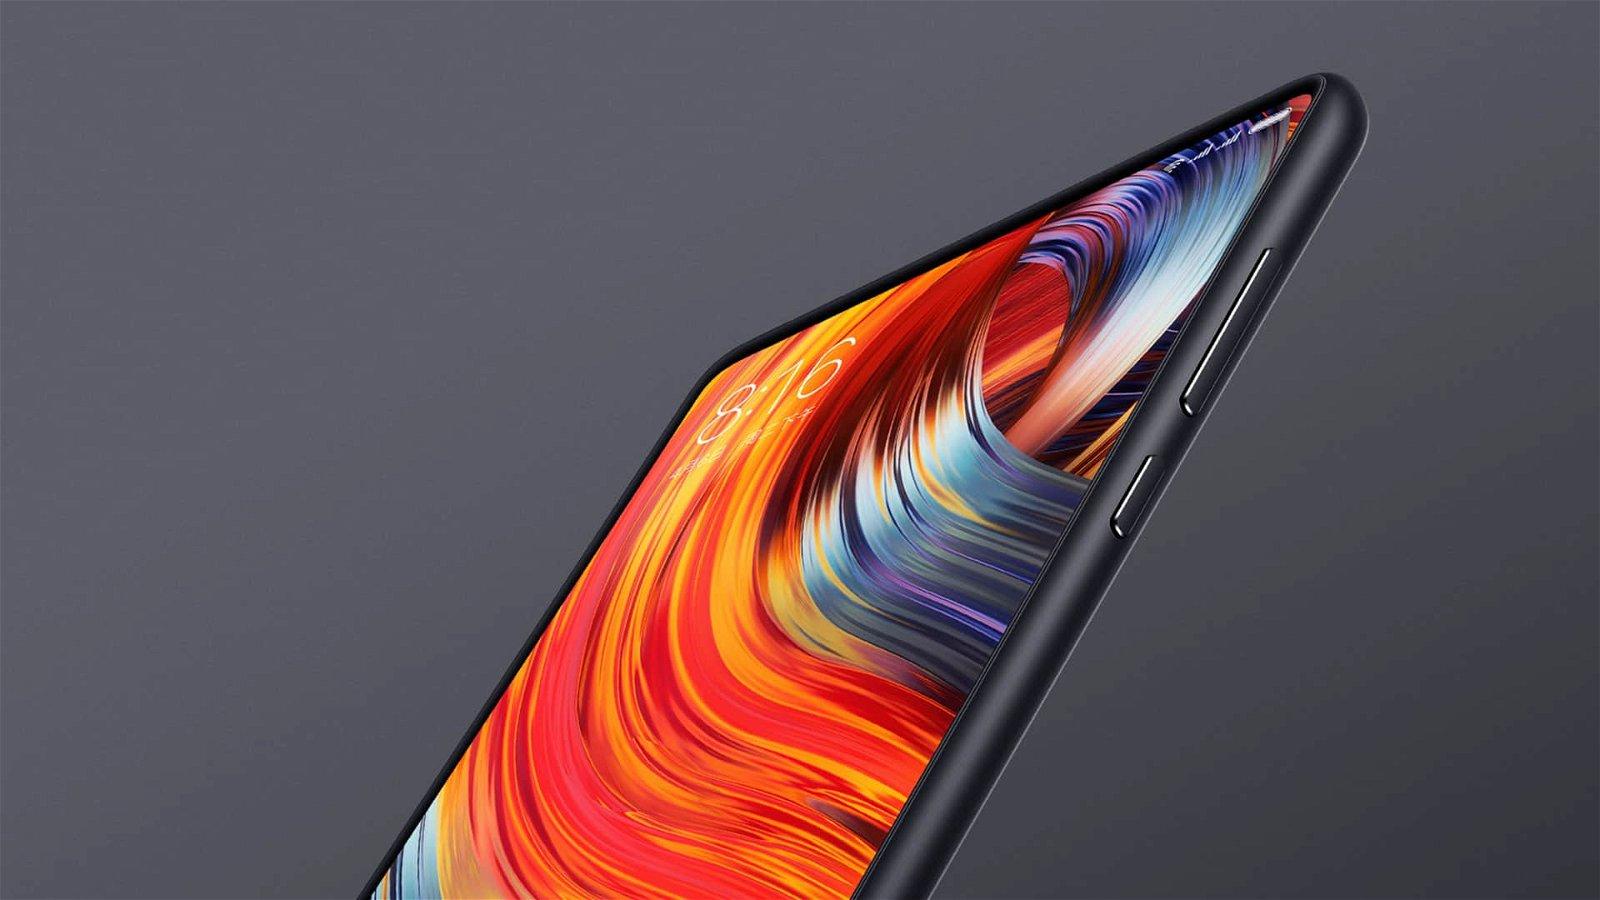 Xiaomi Mi Mix 2S (Smartphone) Review 11